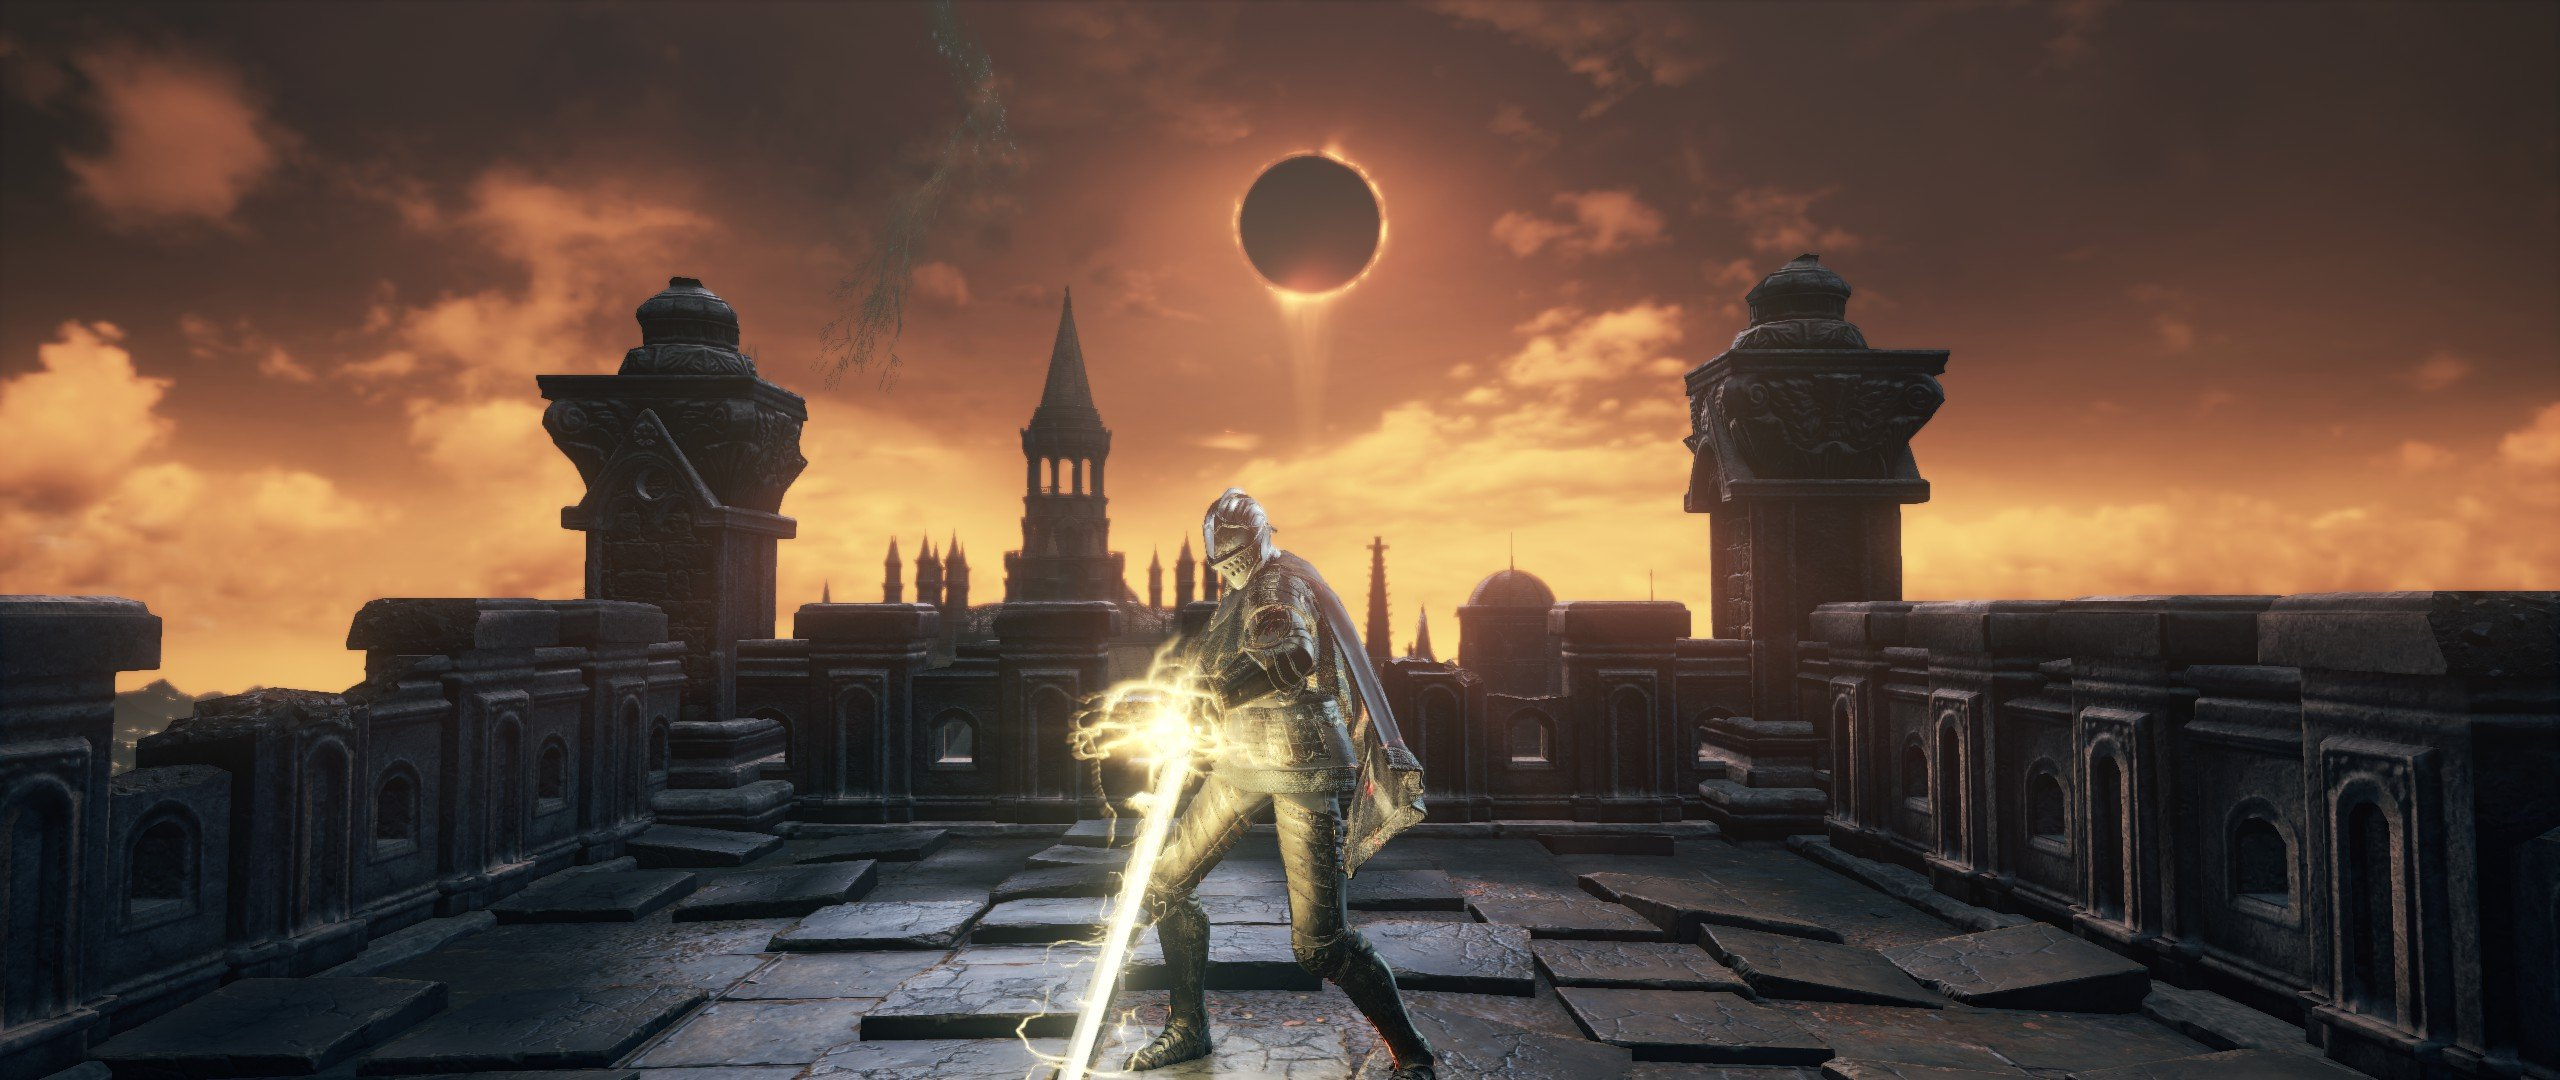 Lightning Blade Dark Souls 3 Wiki Imo S67 Thunder Visual Effect